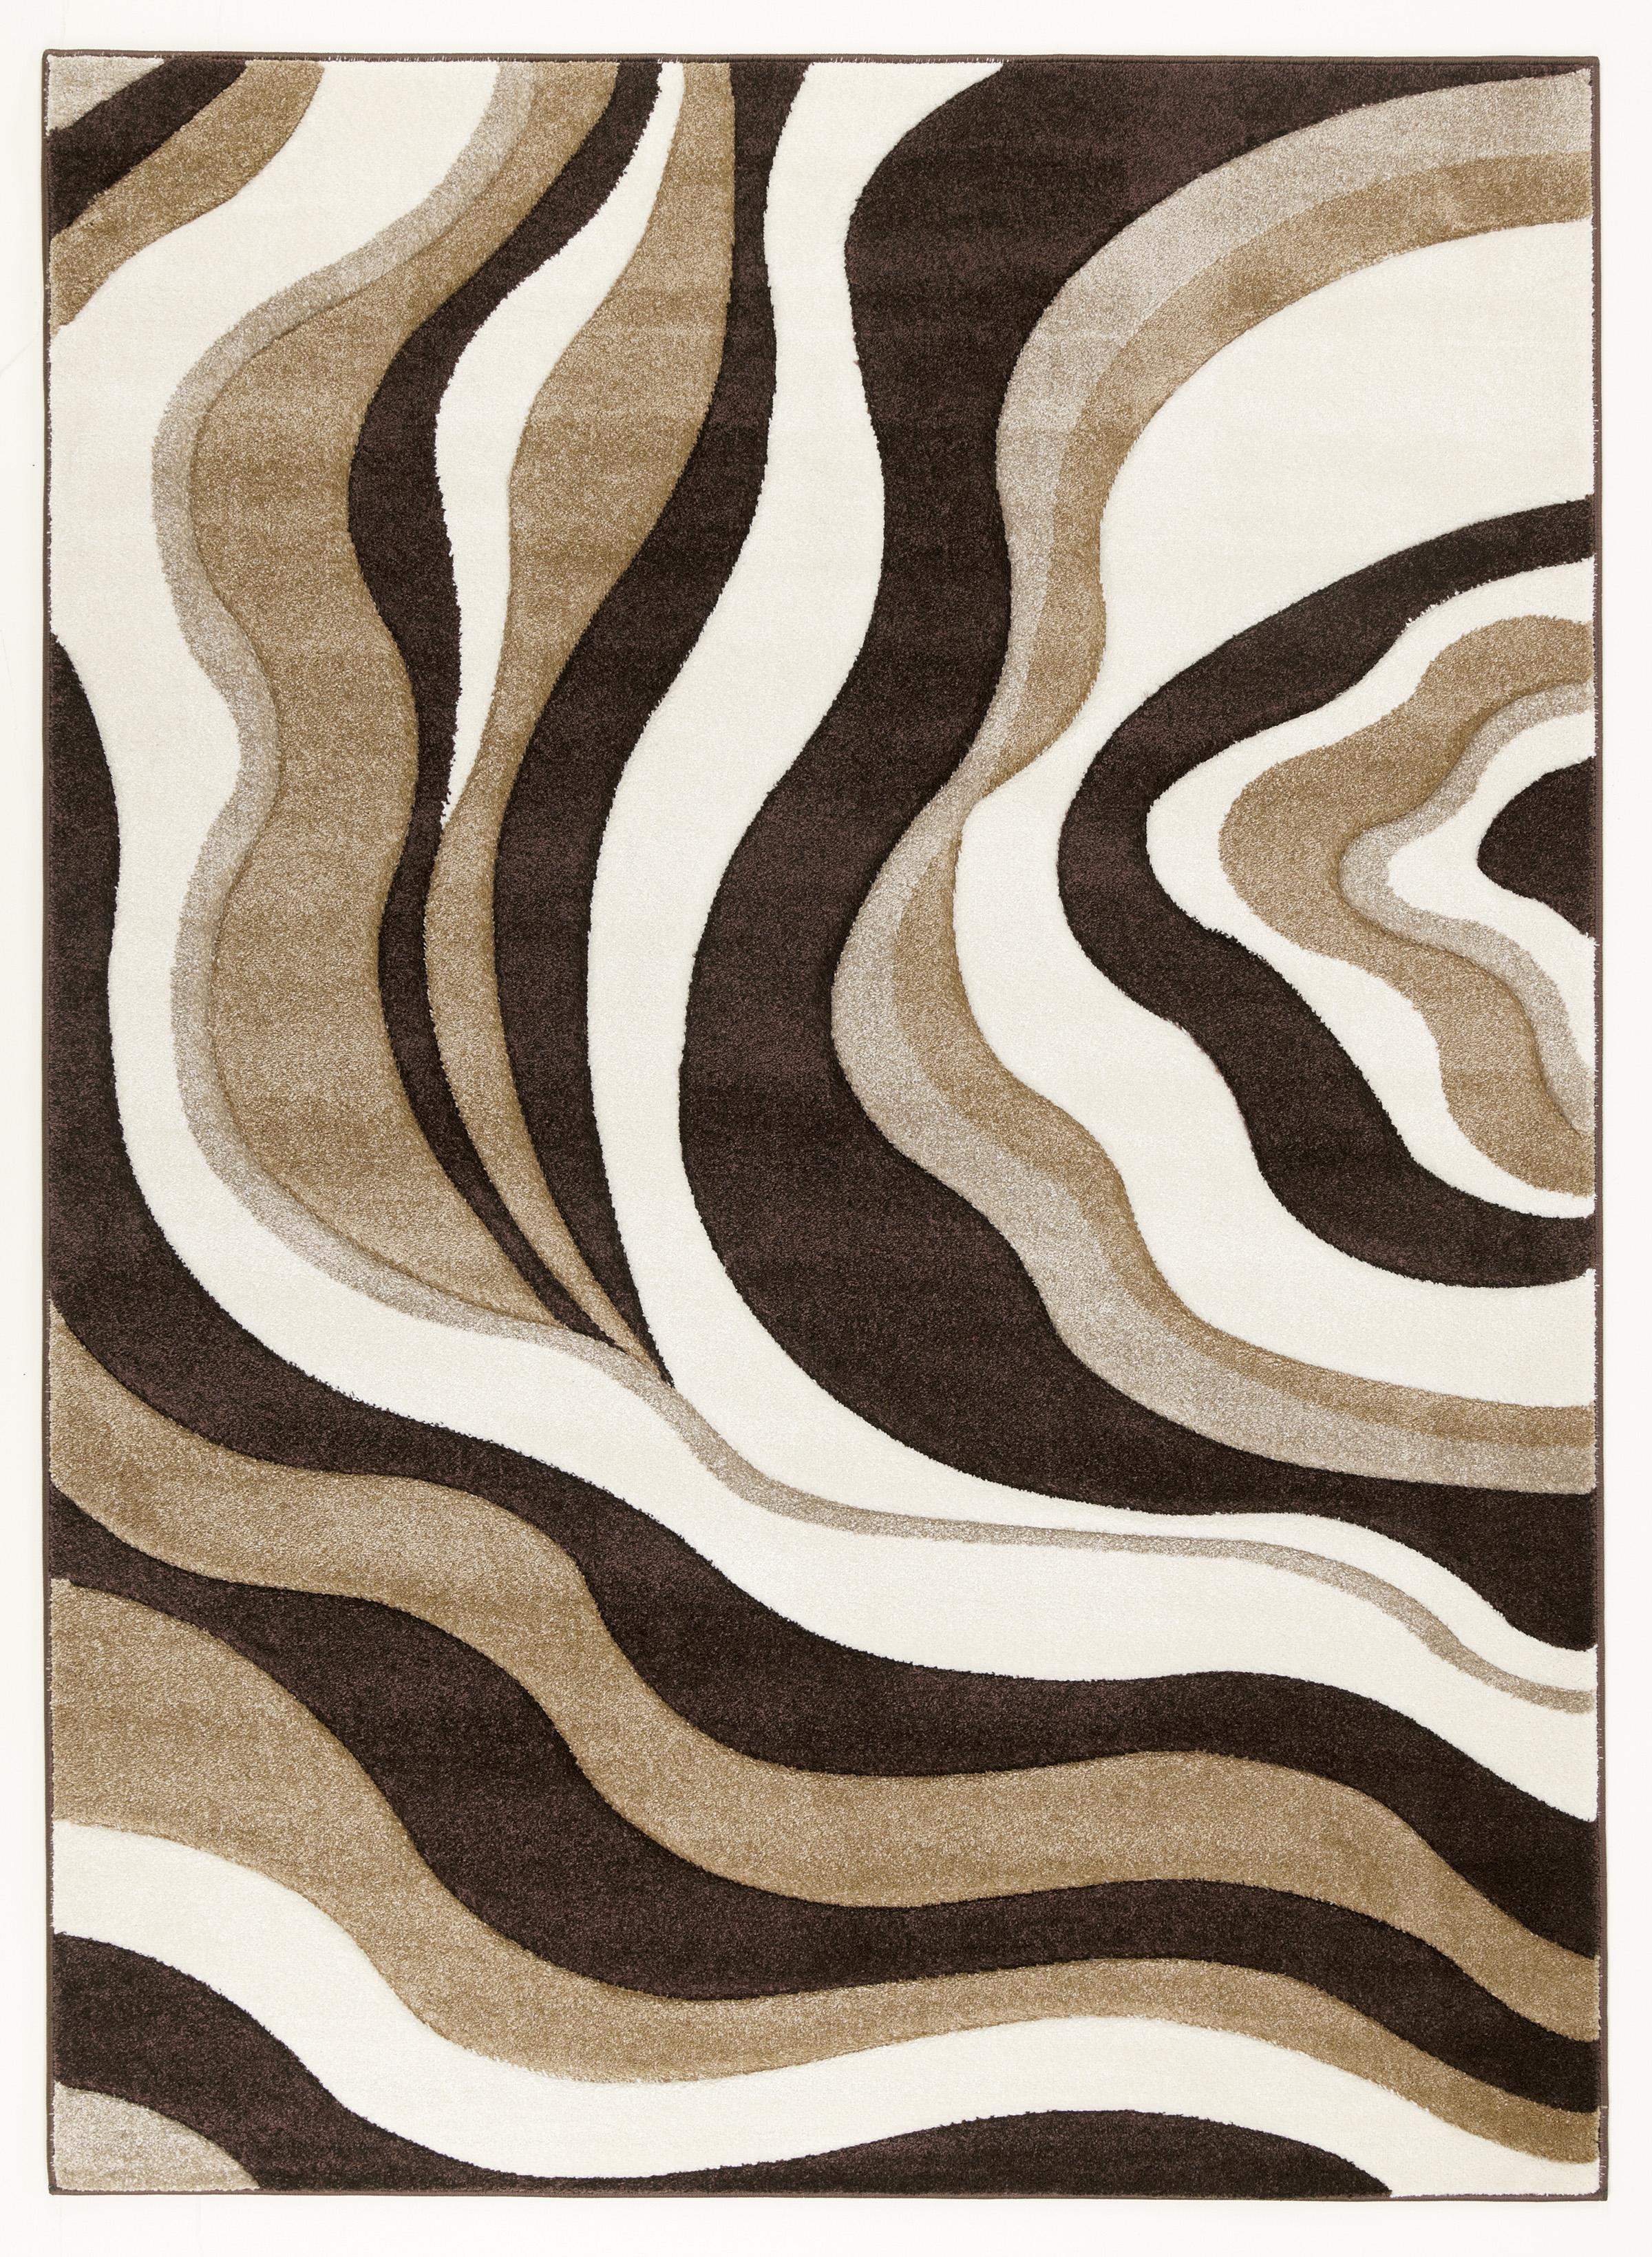 Signature Design by Ashley Furniture Contemporary Area Rugs Rivoletto - Brown  Medium Rug - Item Number: R230002